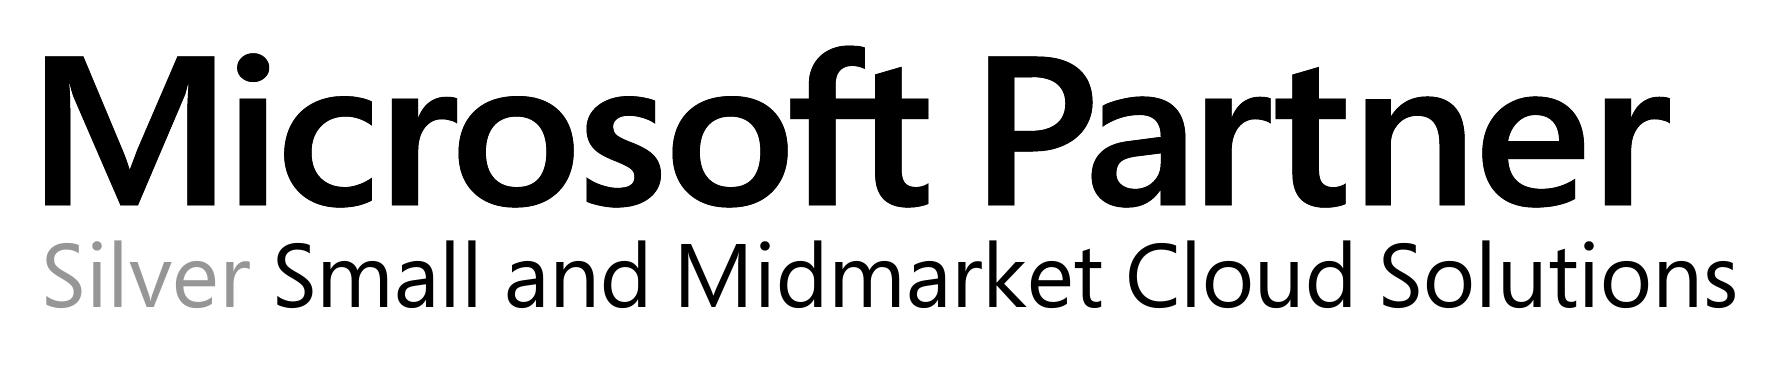 Microsoft Partner - White.png